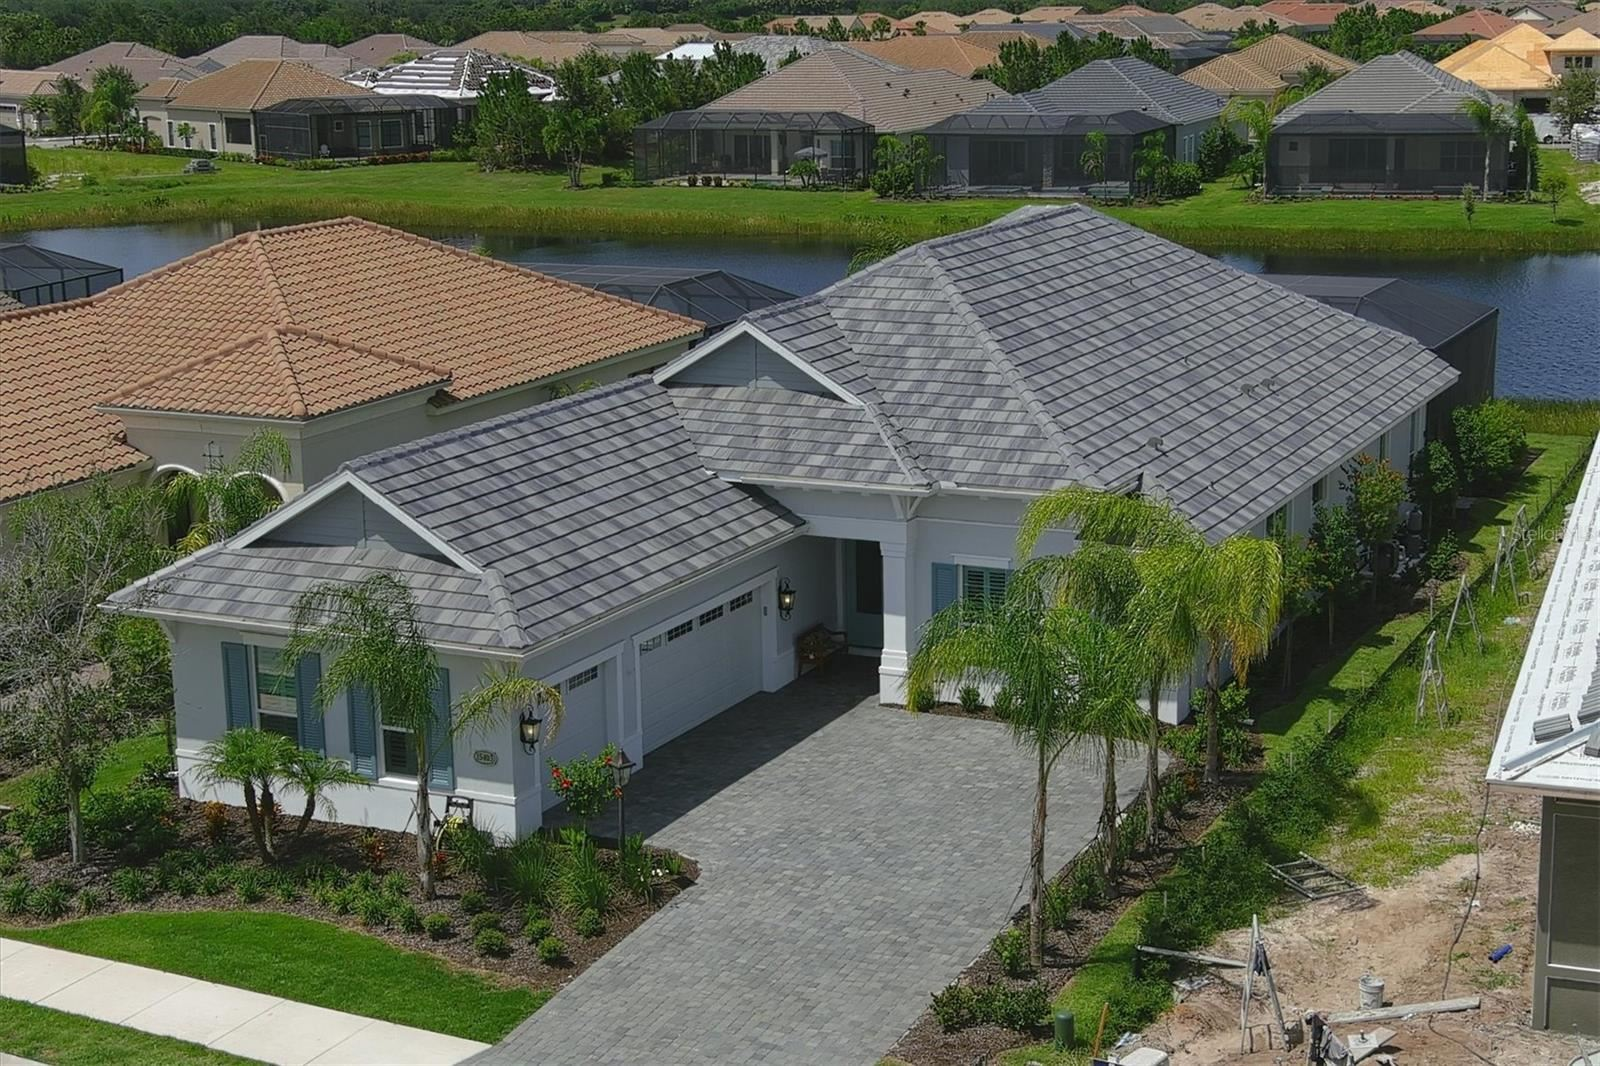 Photo of 15403 CASTLE PARK TERRACE, LAKEWOOD RANCH, FL 34202 (MLS # A4506990)